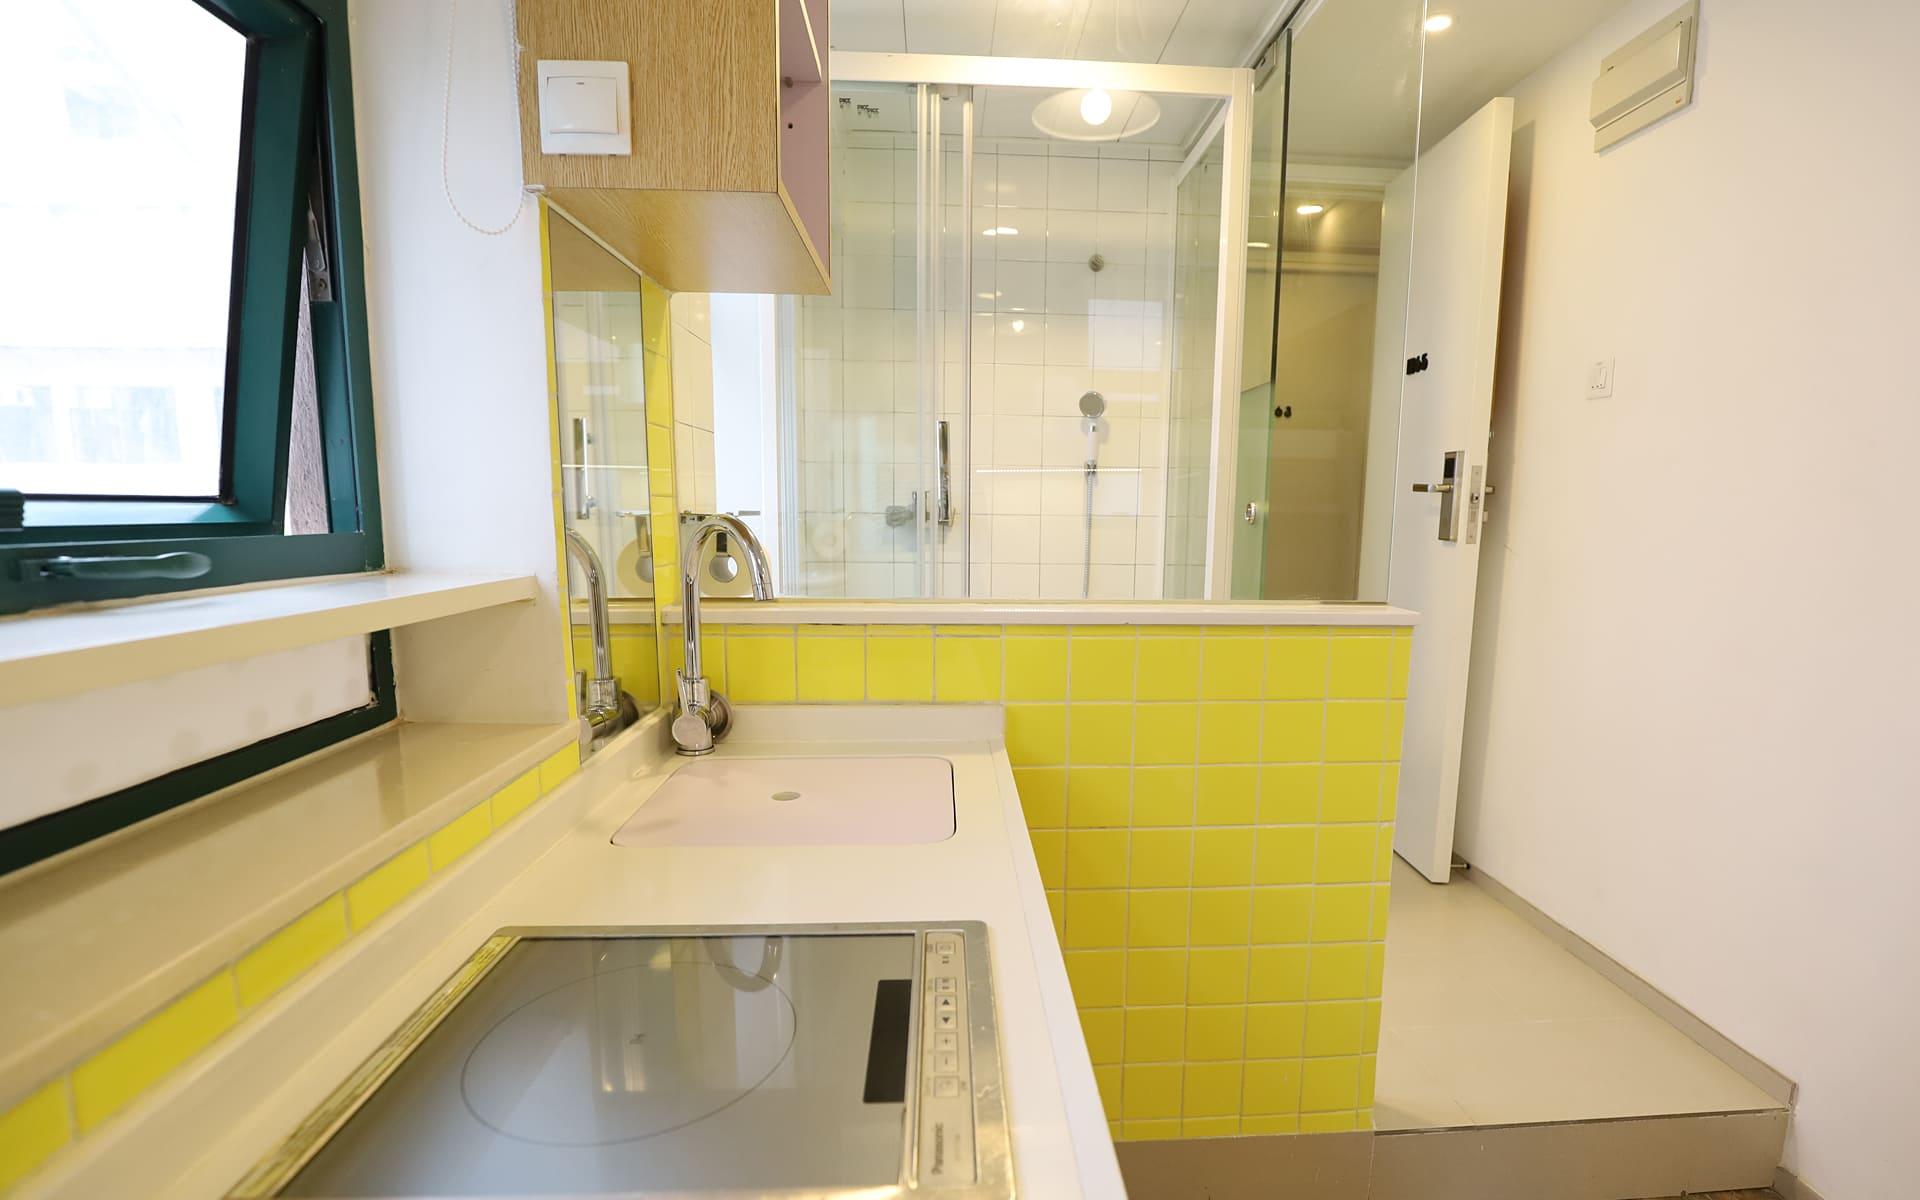 hk_service_apartment_456607071583918690.jpg